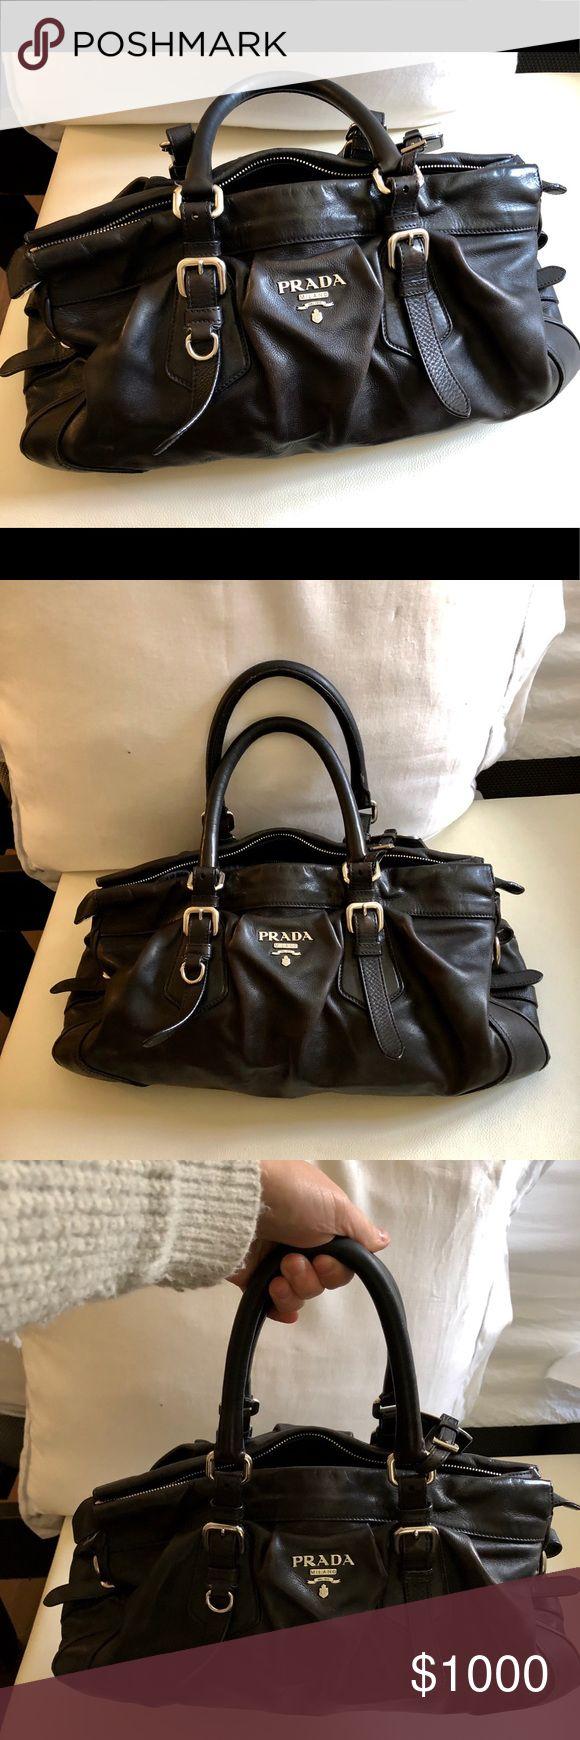 Prada bag (barely used) Black ruched Prada satchel  In great condition! Prada Bags Satchels